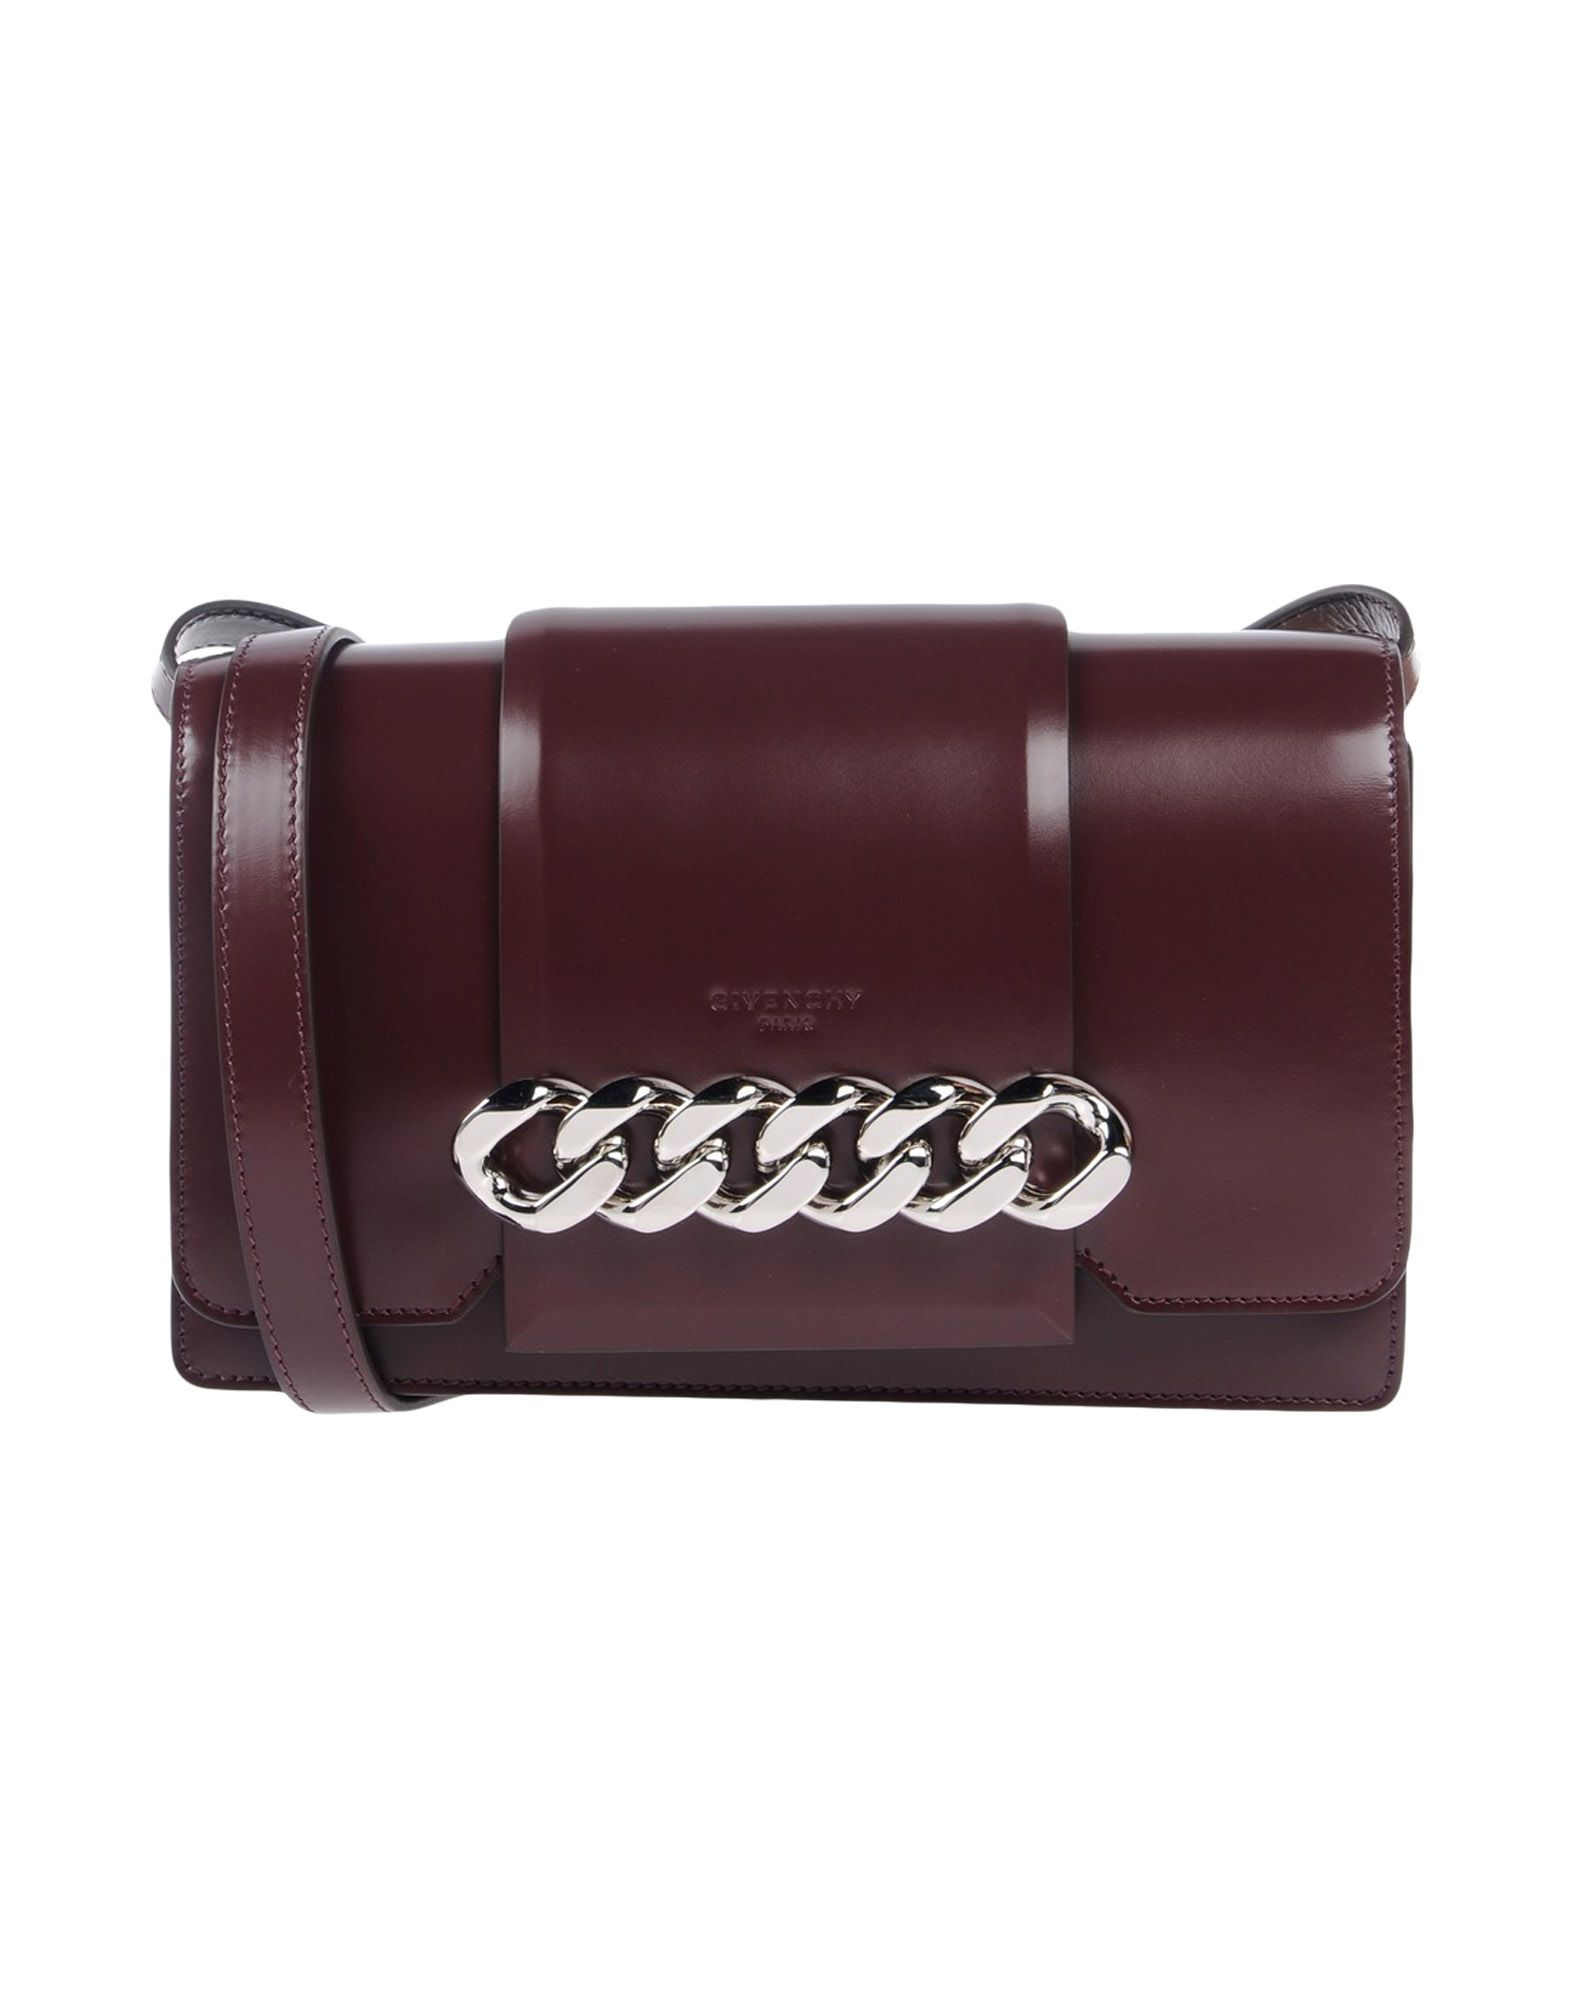 GIVENCHY Сумка через плечо сумка givenchy bb0 5102 012 antigona